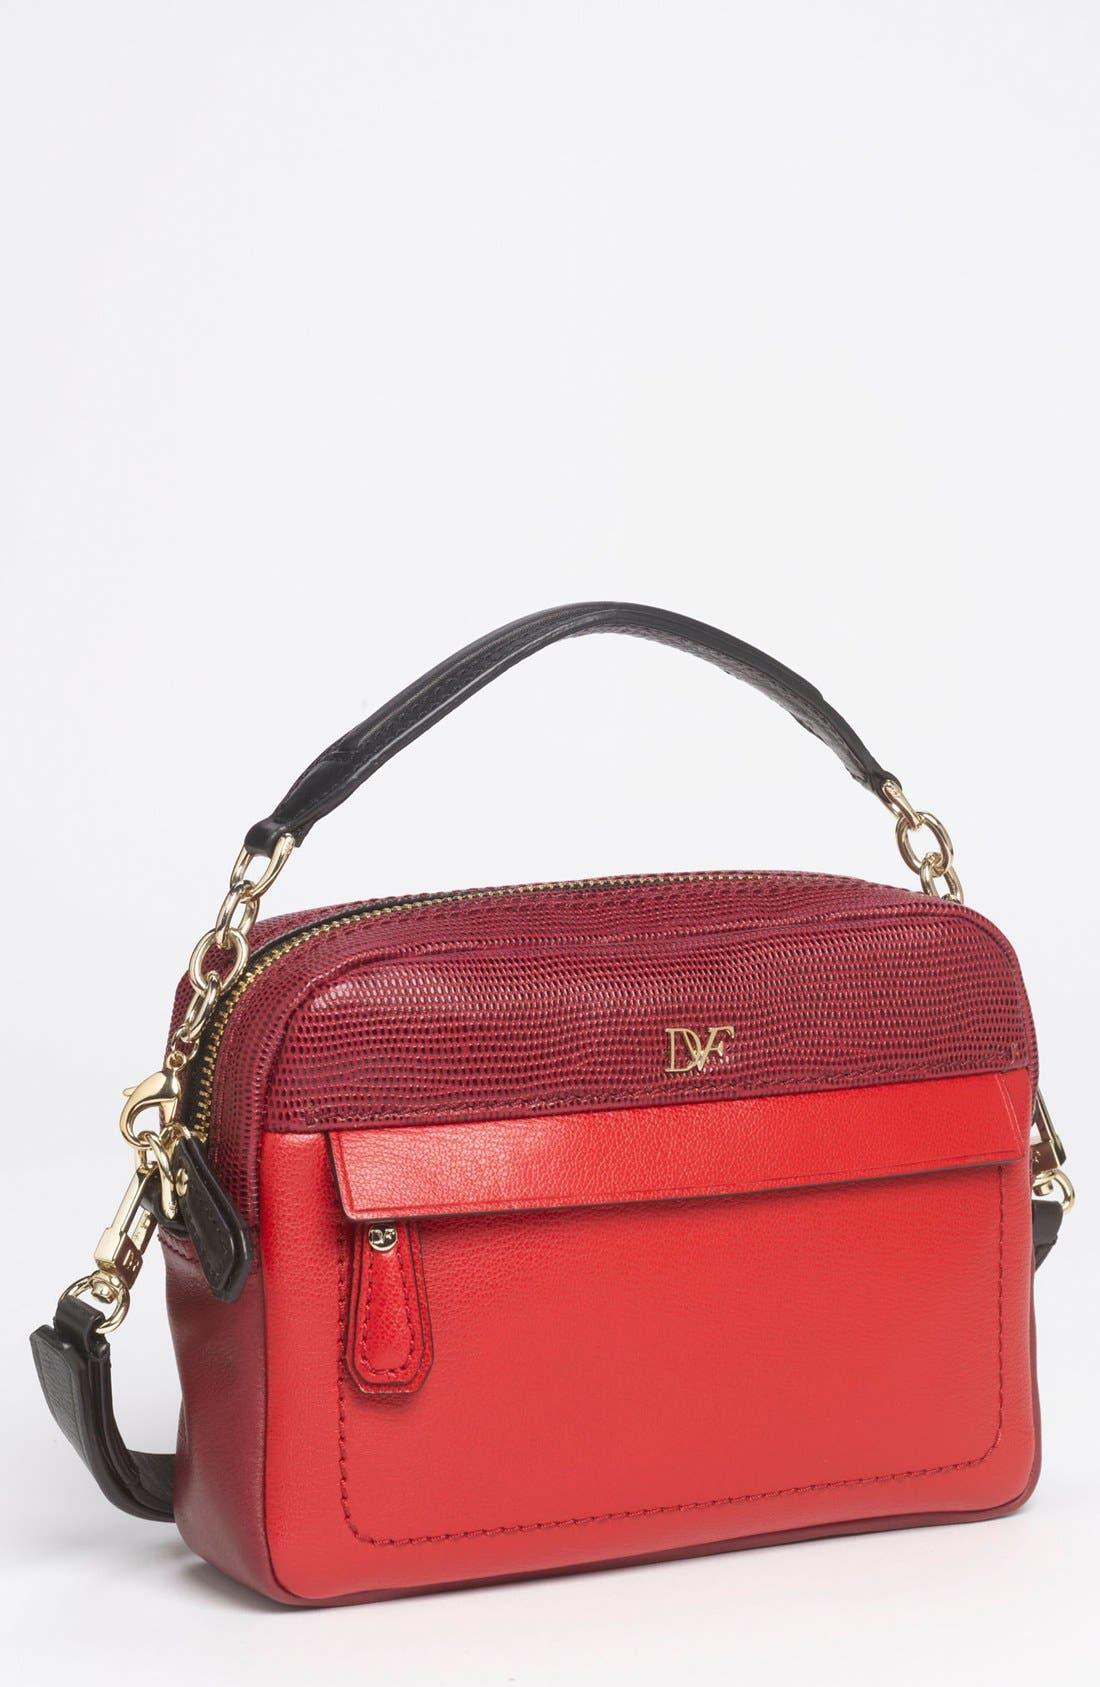 Alternate Image 1 Selected - Diane von Furstenberg 'Milo - Mini' Lizard Embossed Crossbody Bag (Online Only)